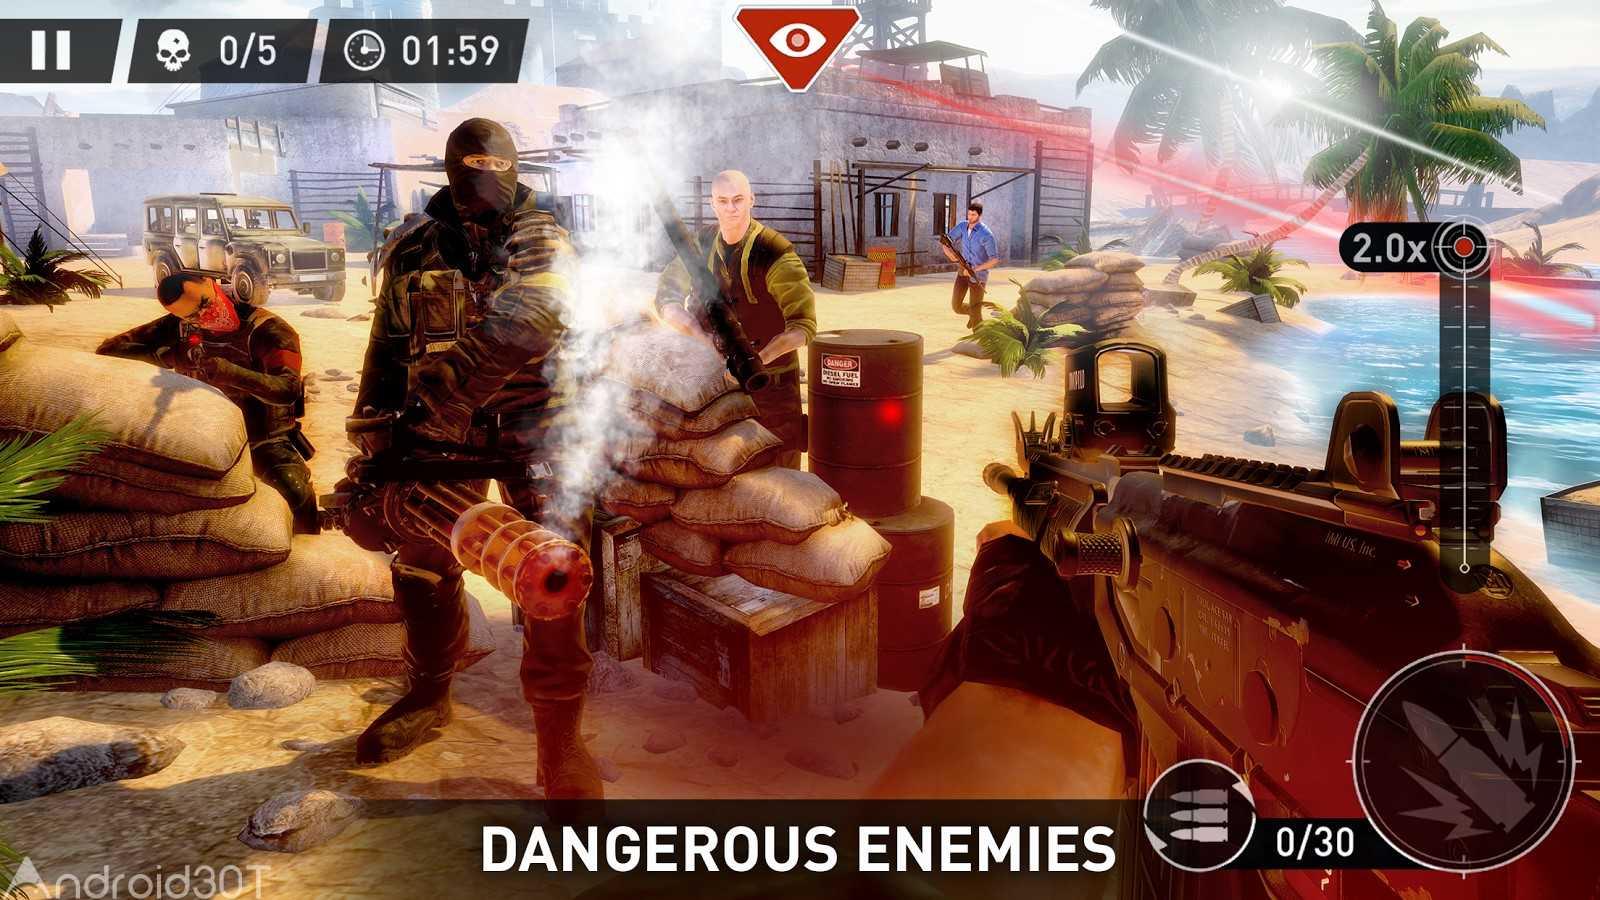 دانلود Sniper: Ghost Warrior 1.1.3 – بازی عالی اکشن اسنایپر اندروید